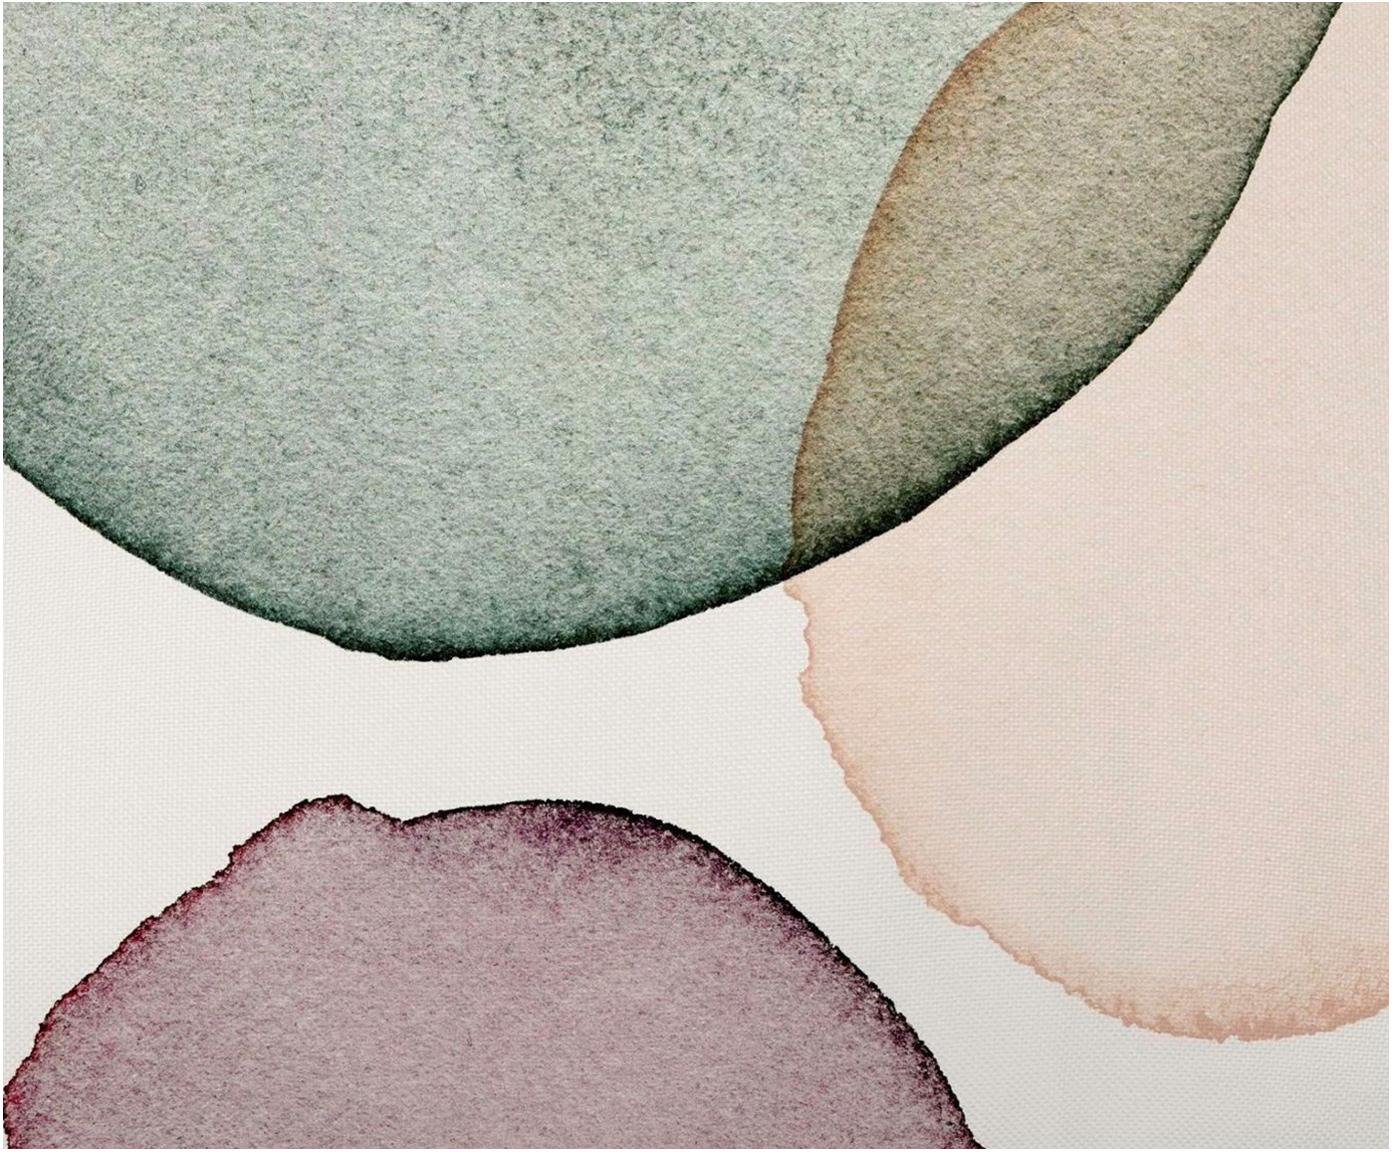 Kissenhülle Calm mit geometrischem Print in Aquarelloptik, 100% Polyester, Weiß, Grün, Lila, Lachsfarben, 40 x 40 cm